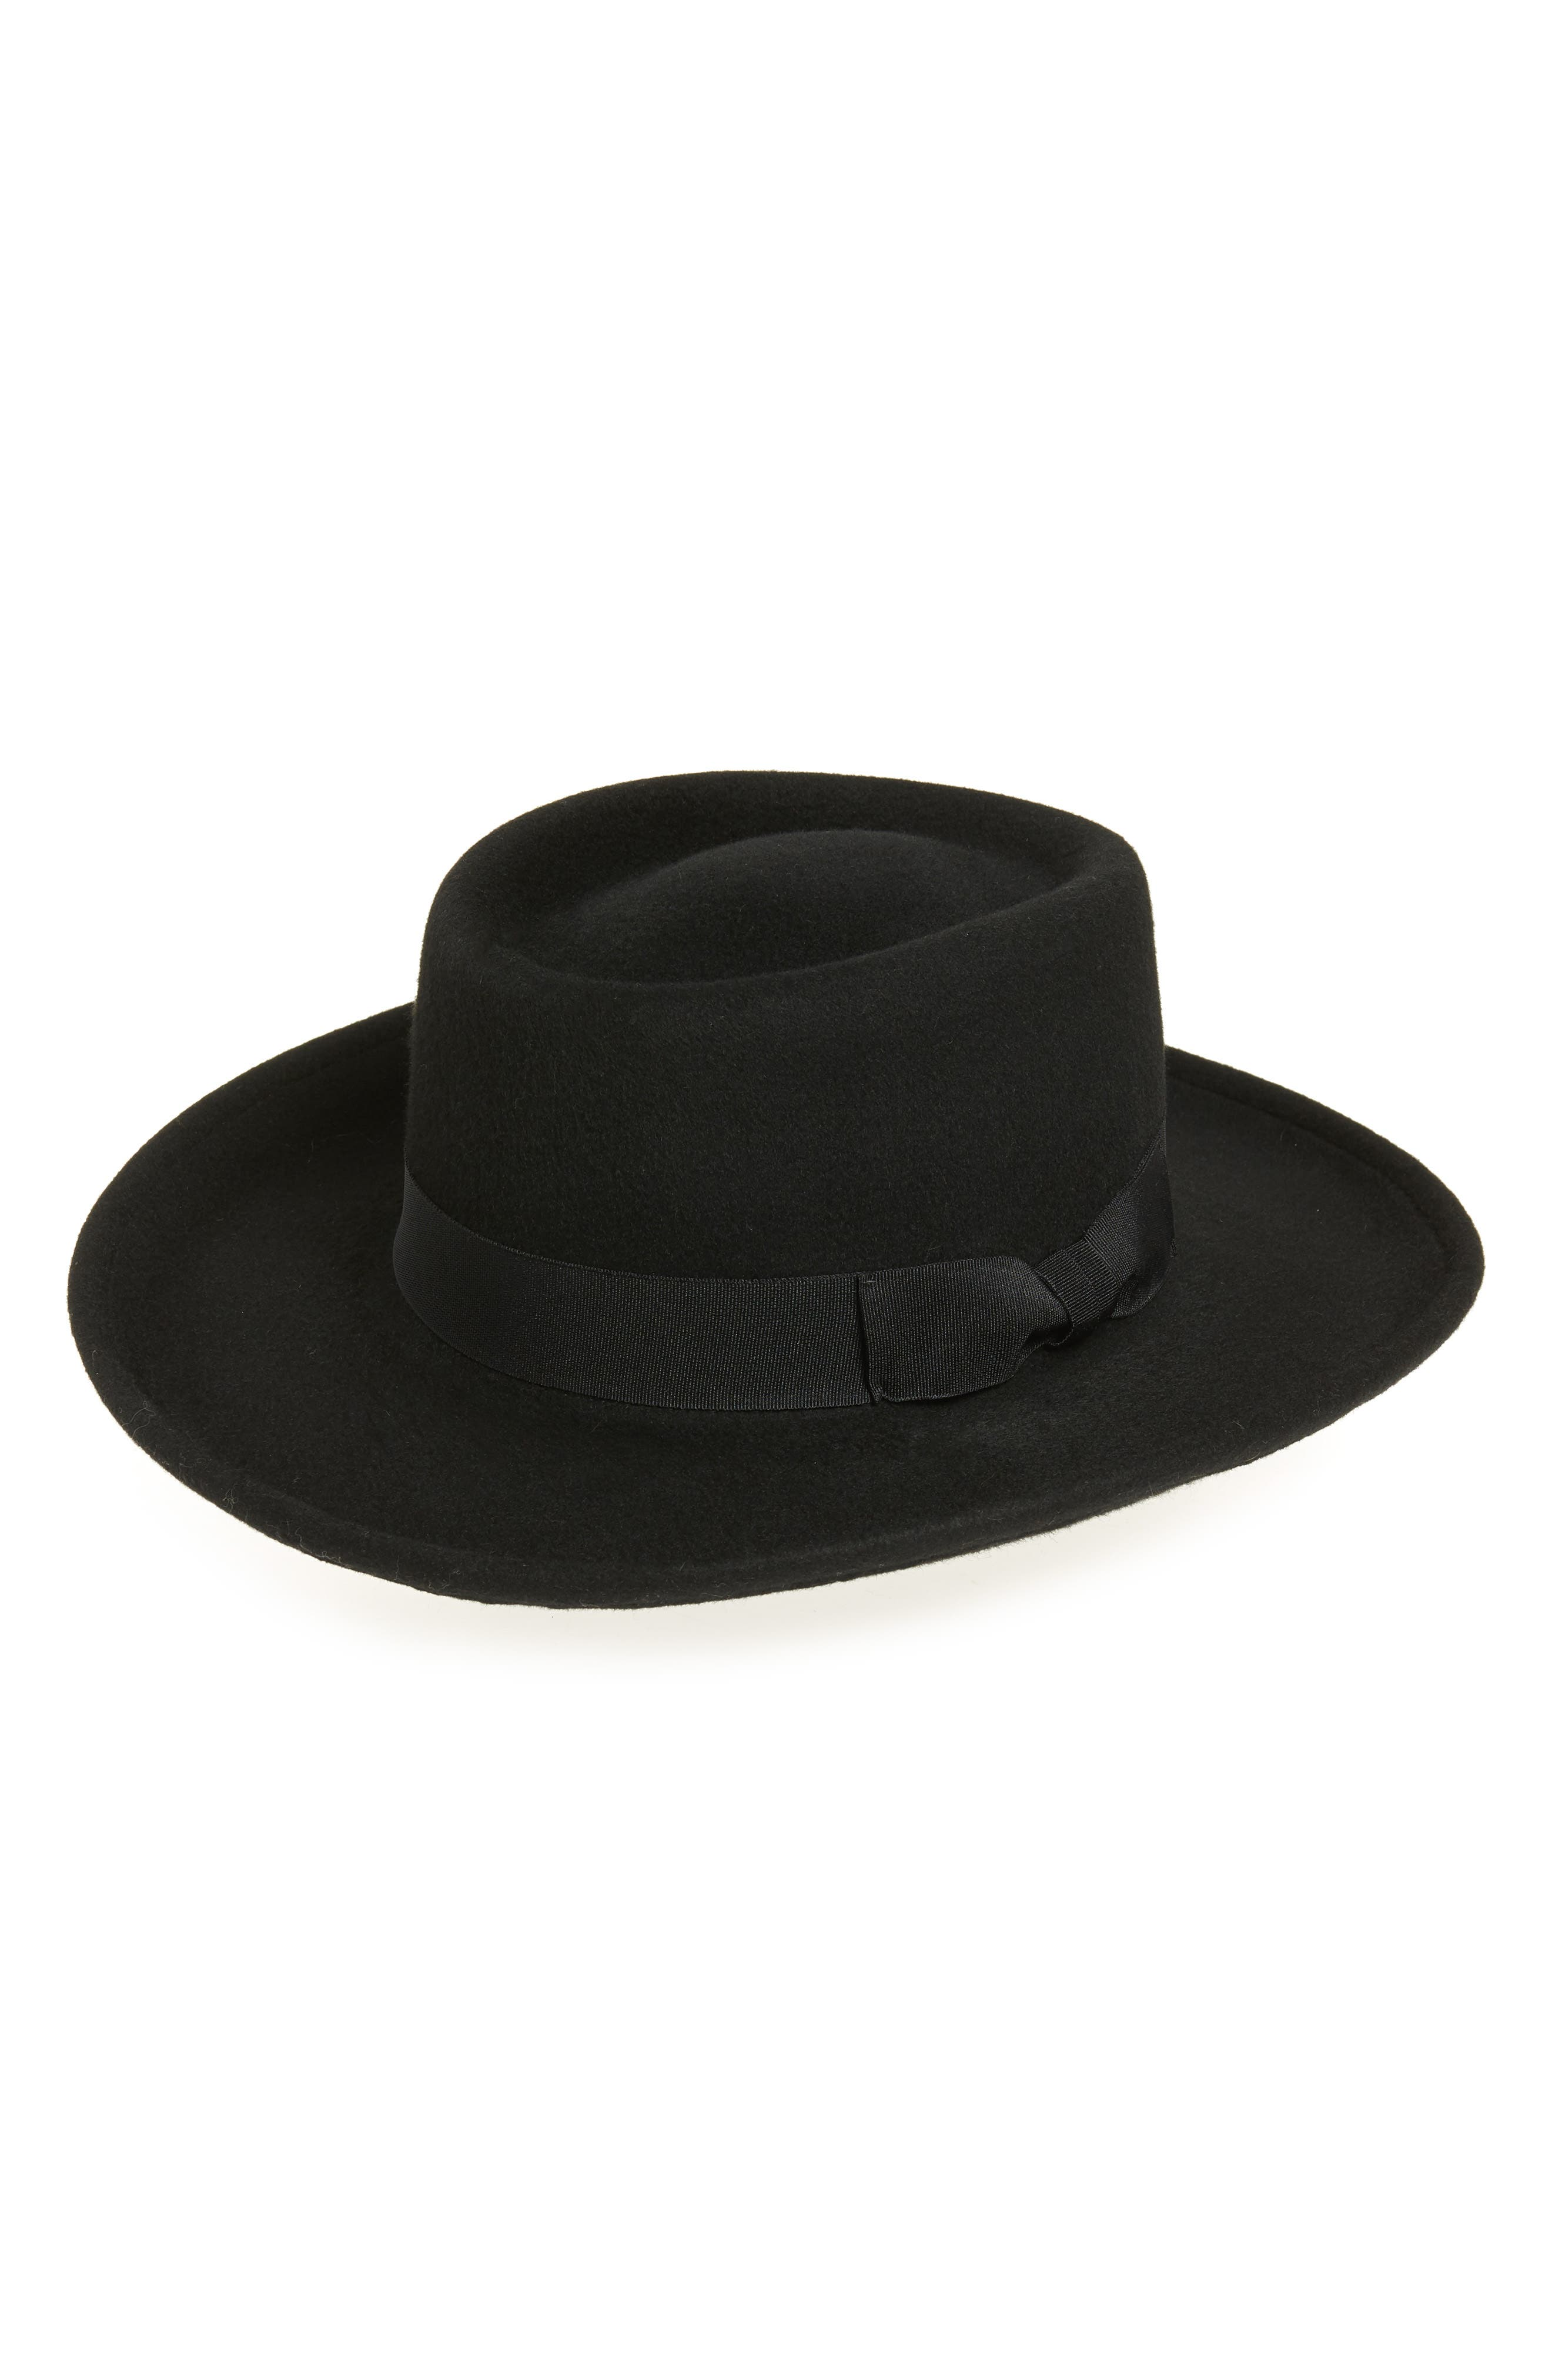 New Edwardian Style Men's Hats 1900-1920 Womens Eric Javits Planter Packable Wool Felt Hat - $215.00 AT vintagedancer.com